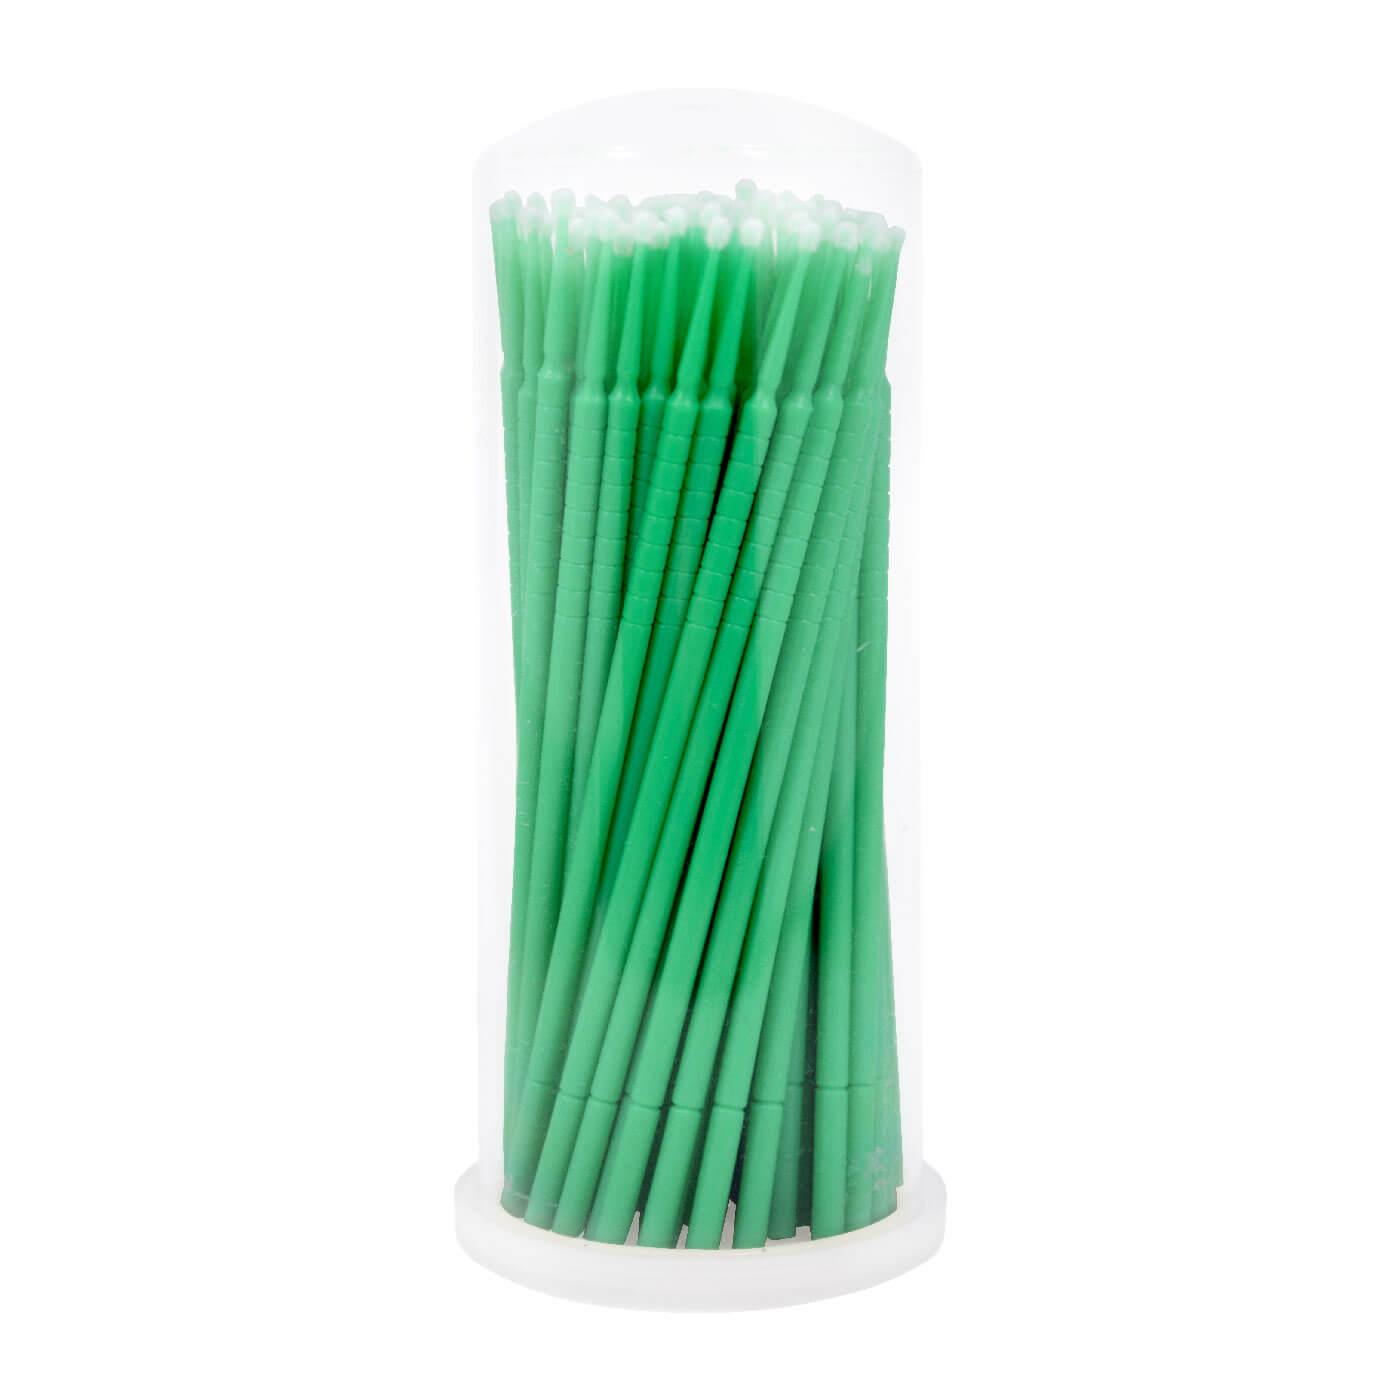 Microbrush Cotonetes para Cílios 100un